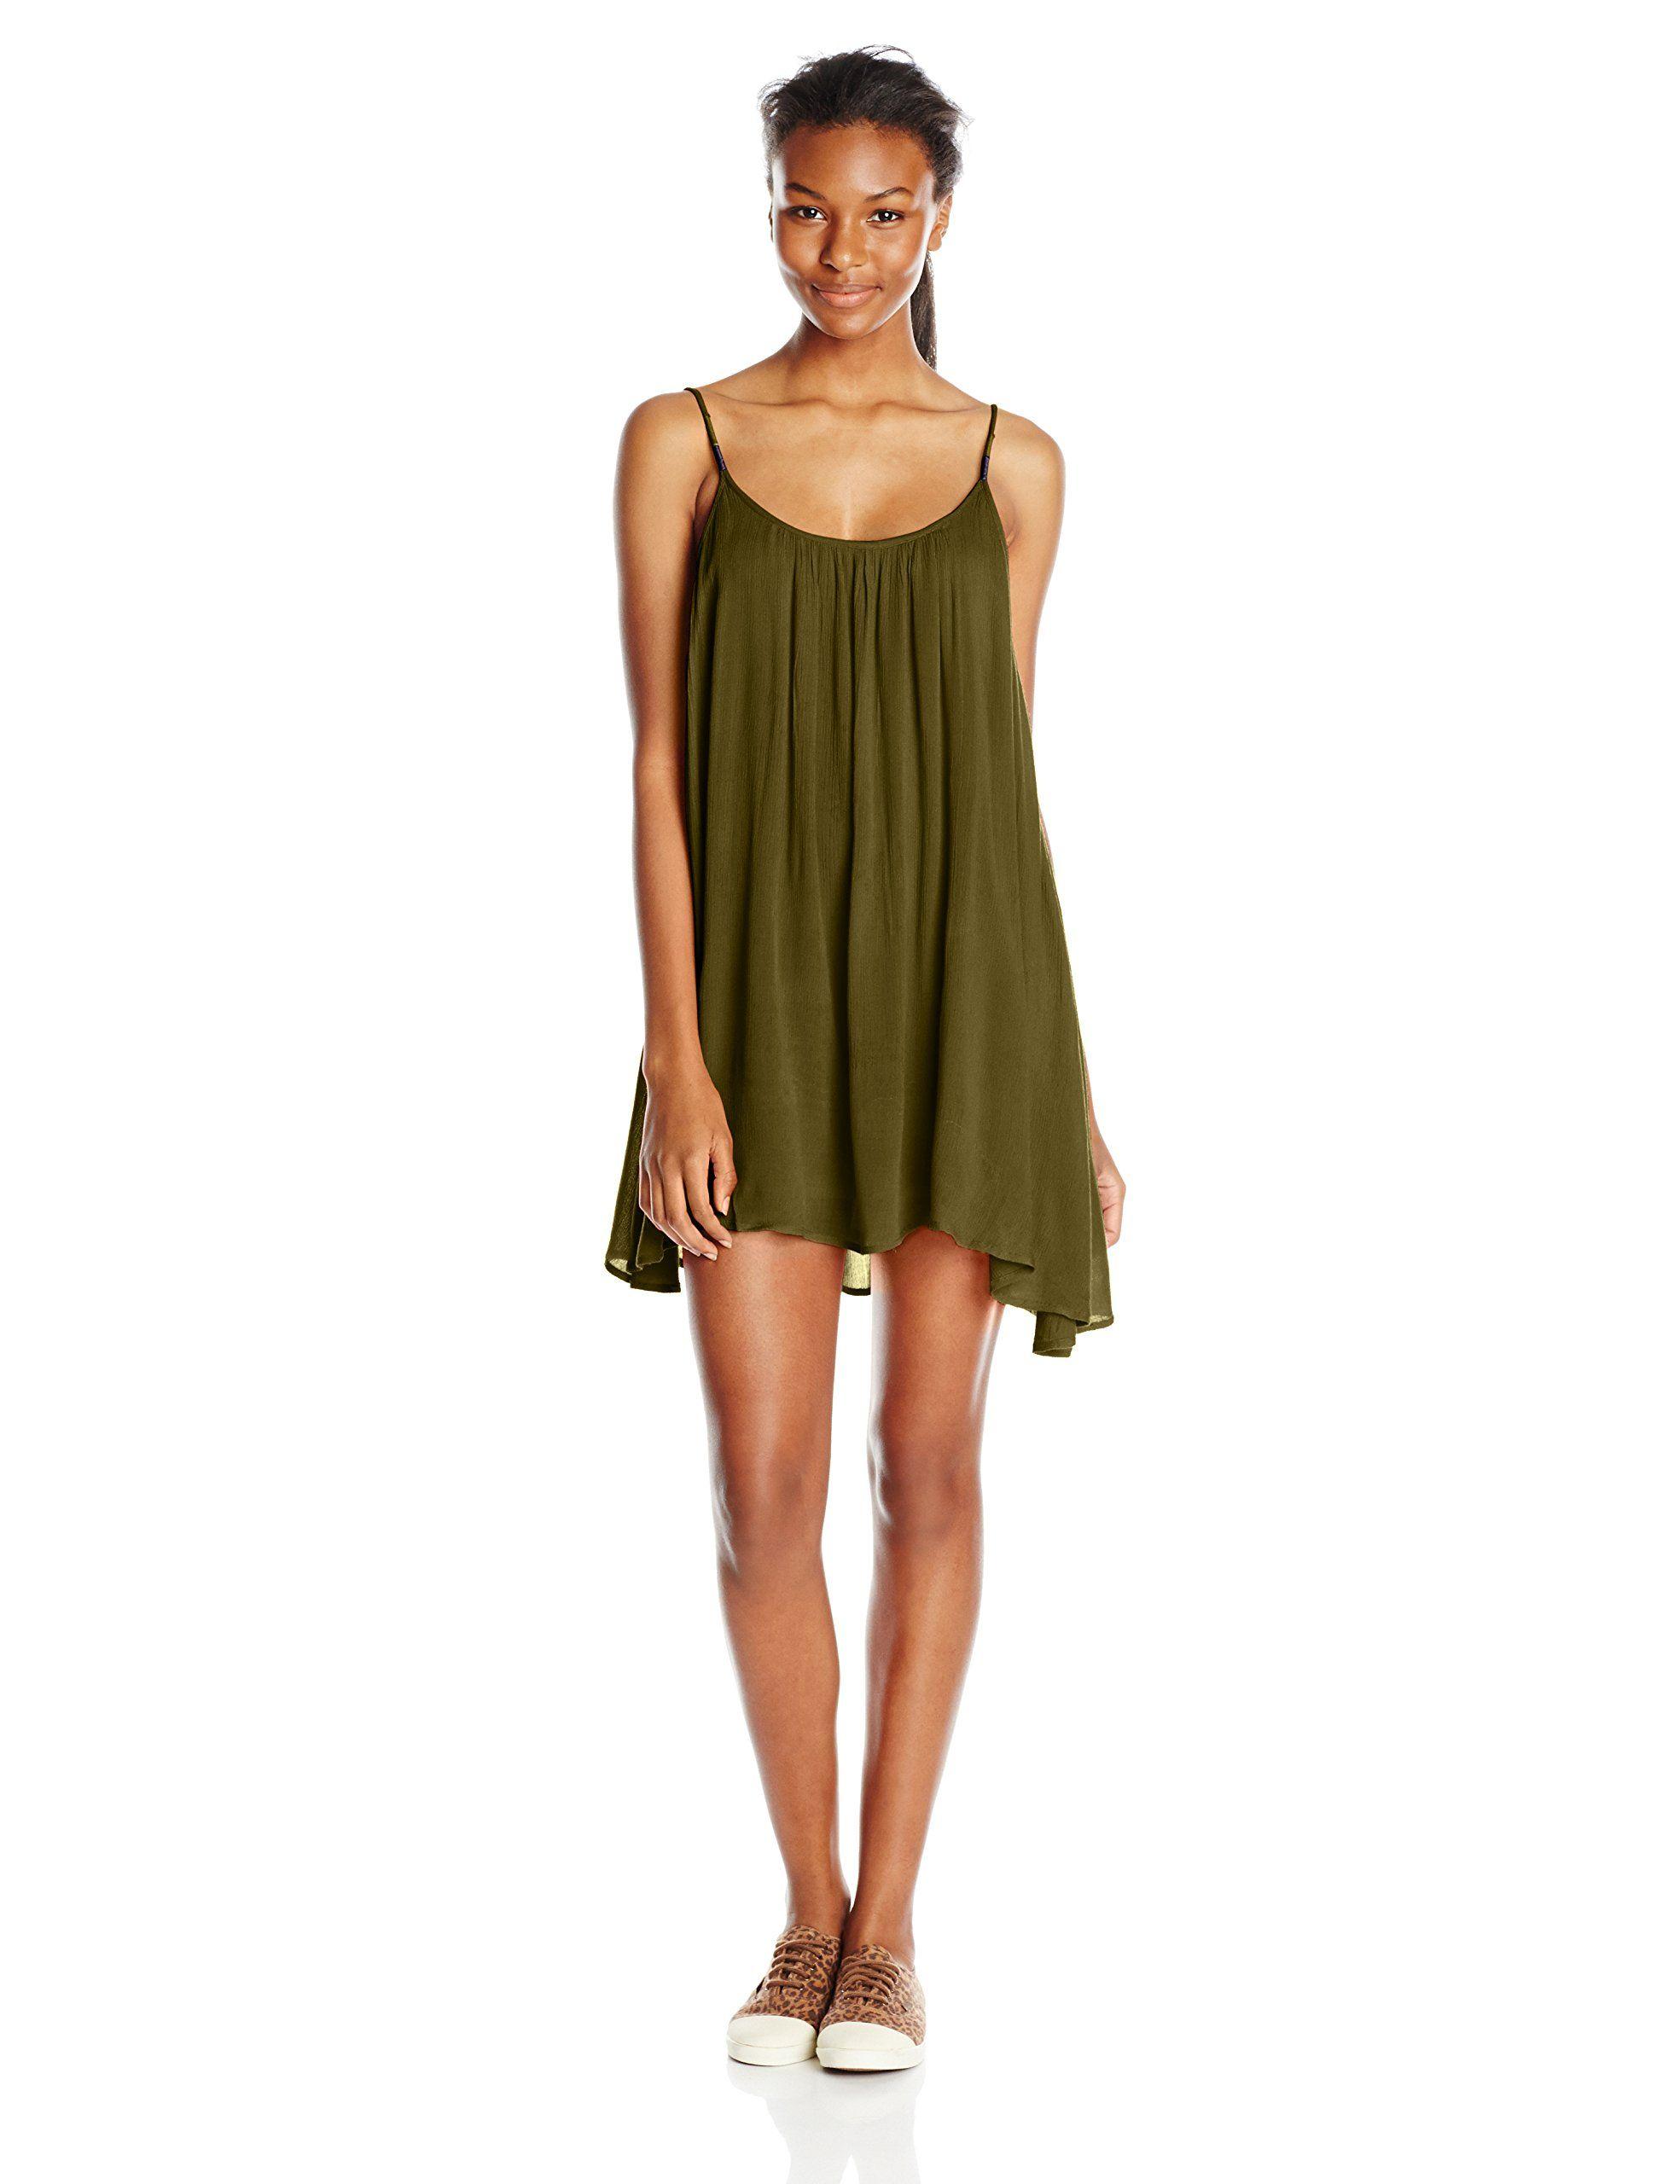 Explore Cheap Dresses, Summer Dresses and more!